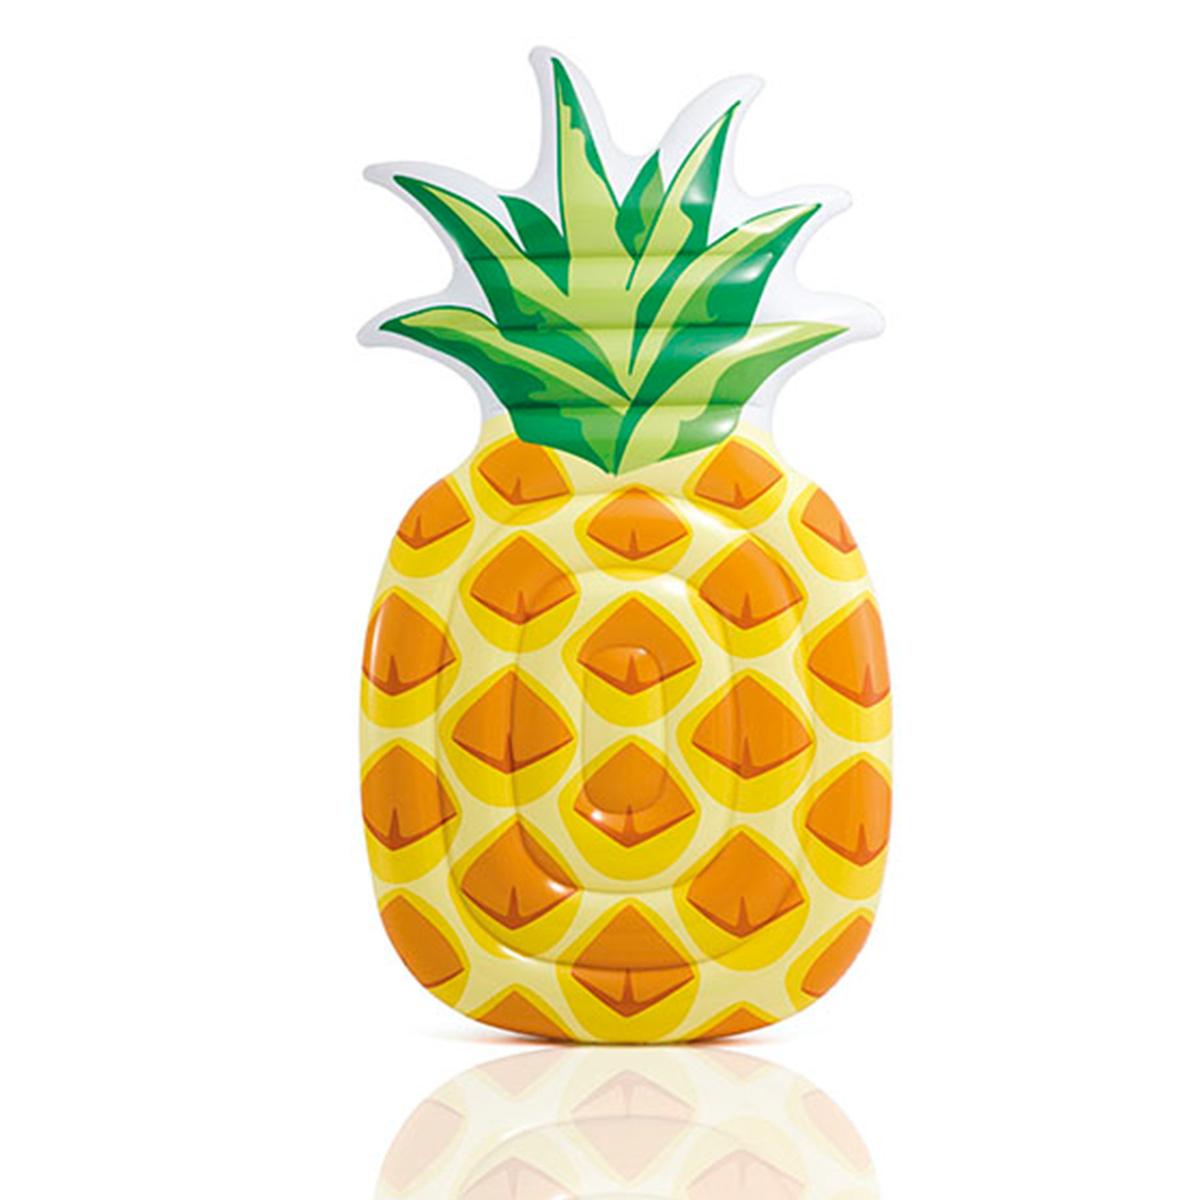 Intex opblaasbare ananas (216 cm)